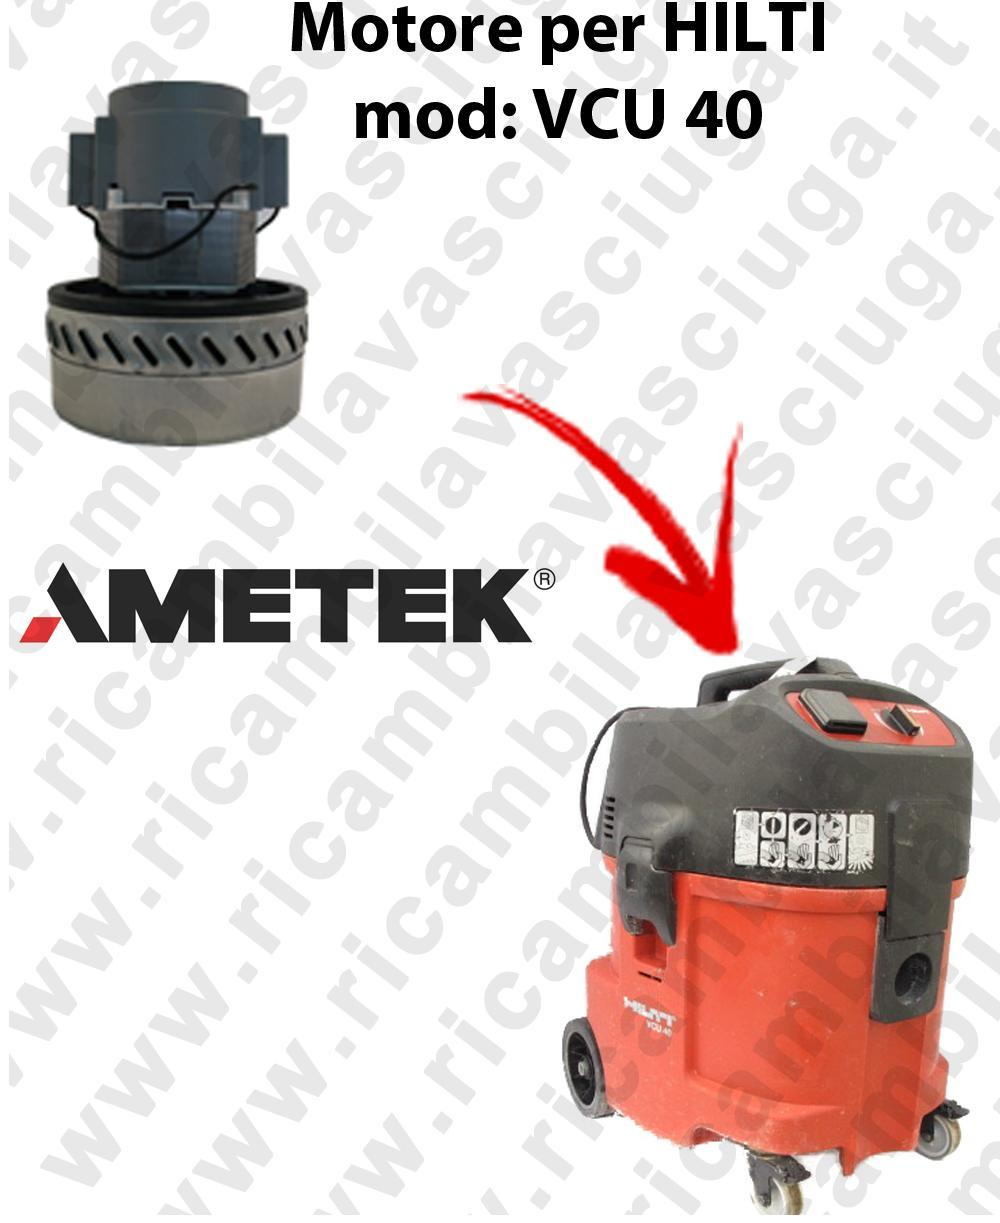 VCU 40 AMETEK VACUUM MOTOR for vacuum cleaner wet and dry HILTI